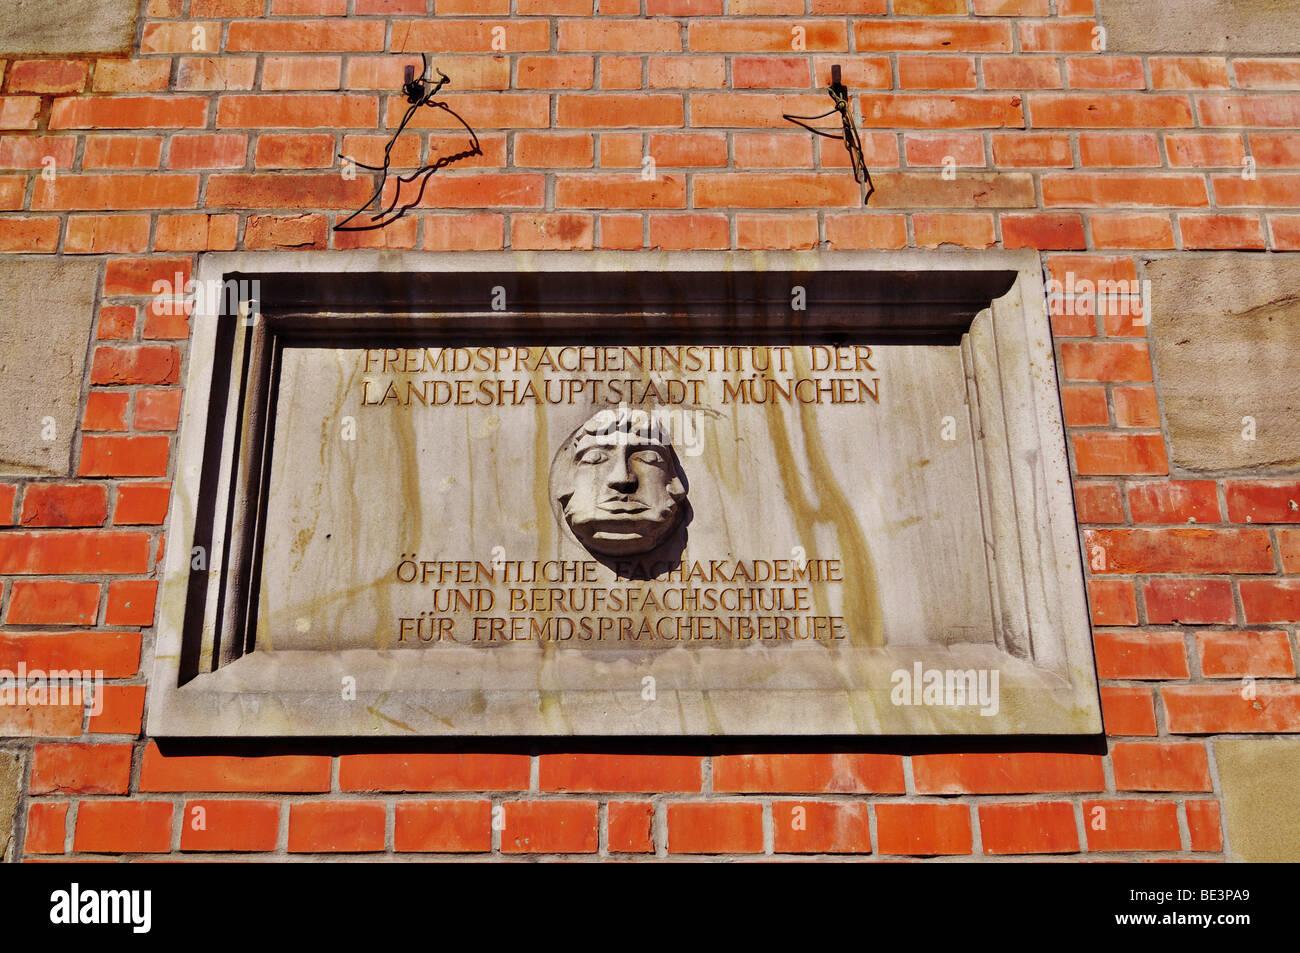 Sign of the Fremdspracheninstitut, Foreign Language Institute, Schwabing, Munich, Bavaria, Germany, Europe - Stock Image